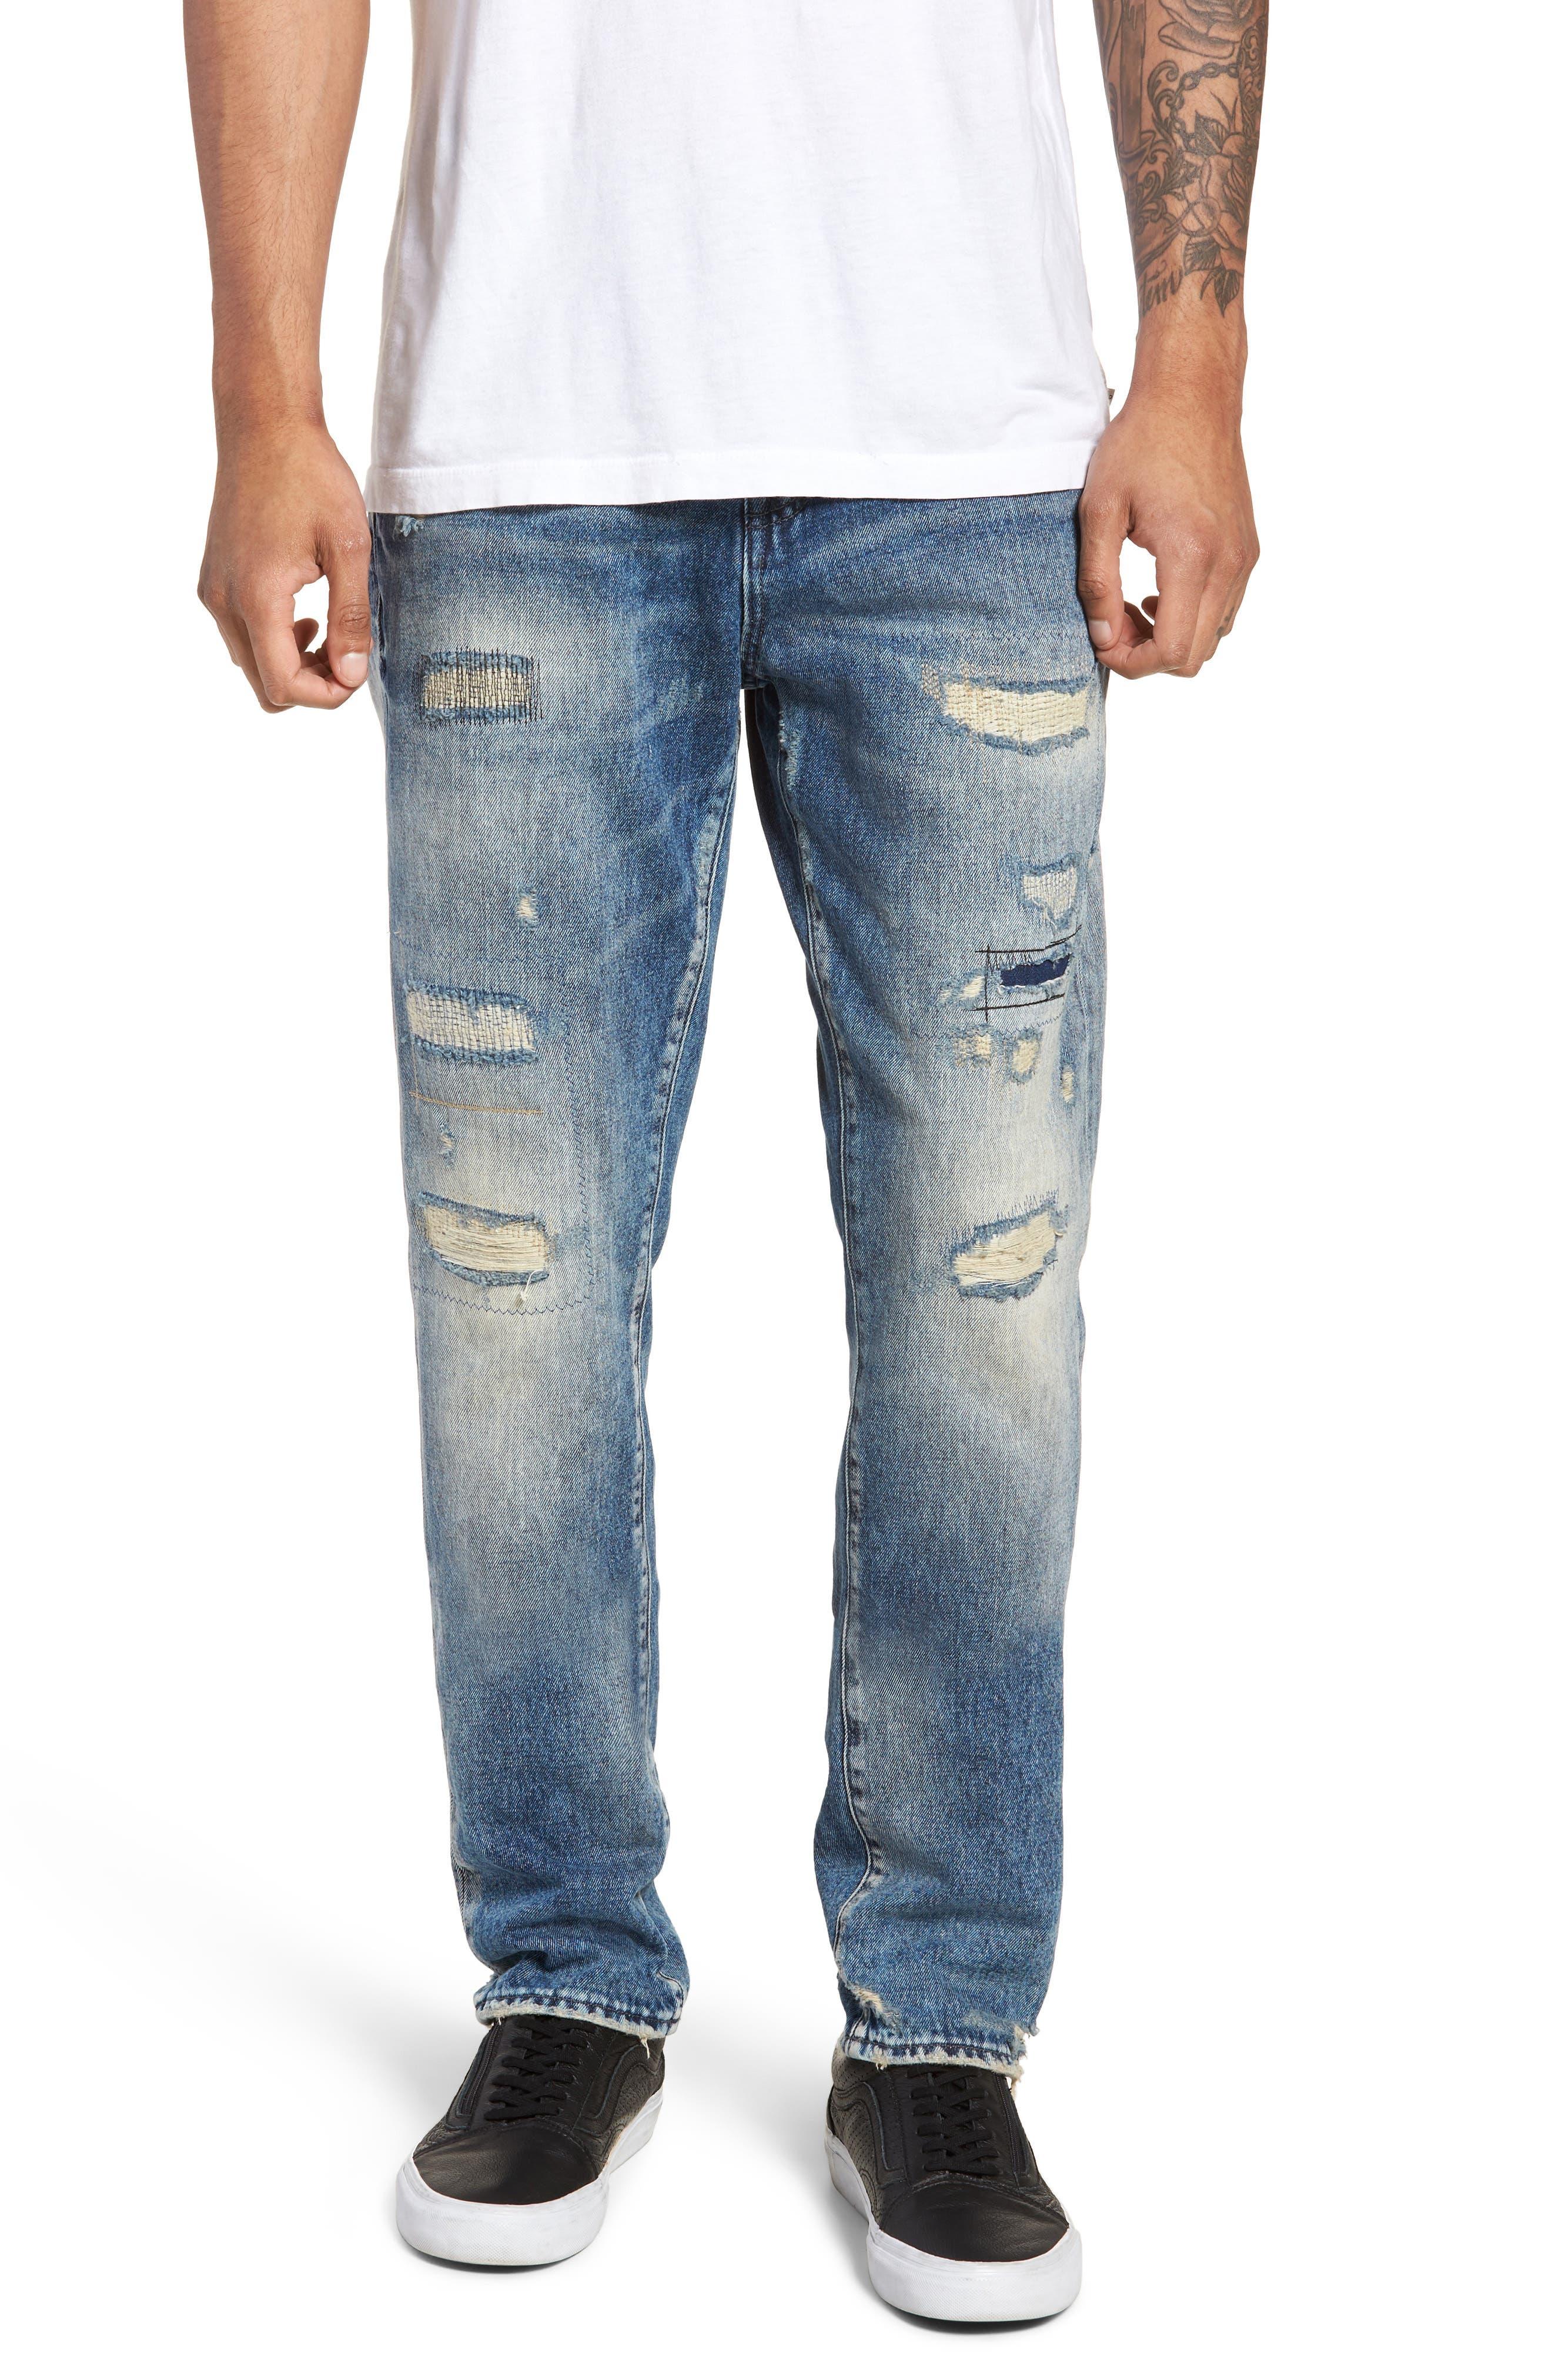 Demon Slim Straight Leg Jeans,                         Main,                         color, Mexico